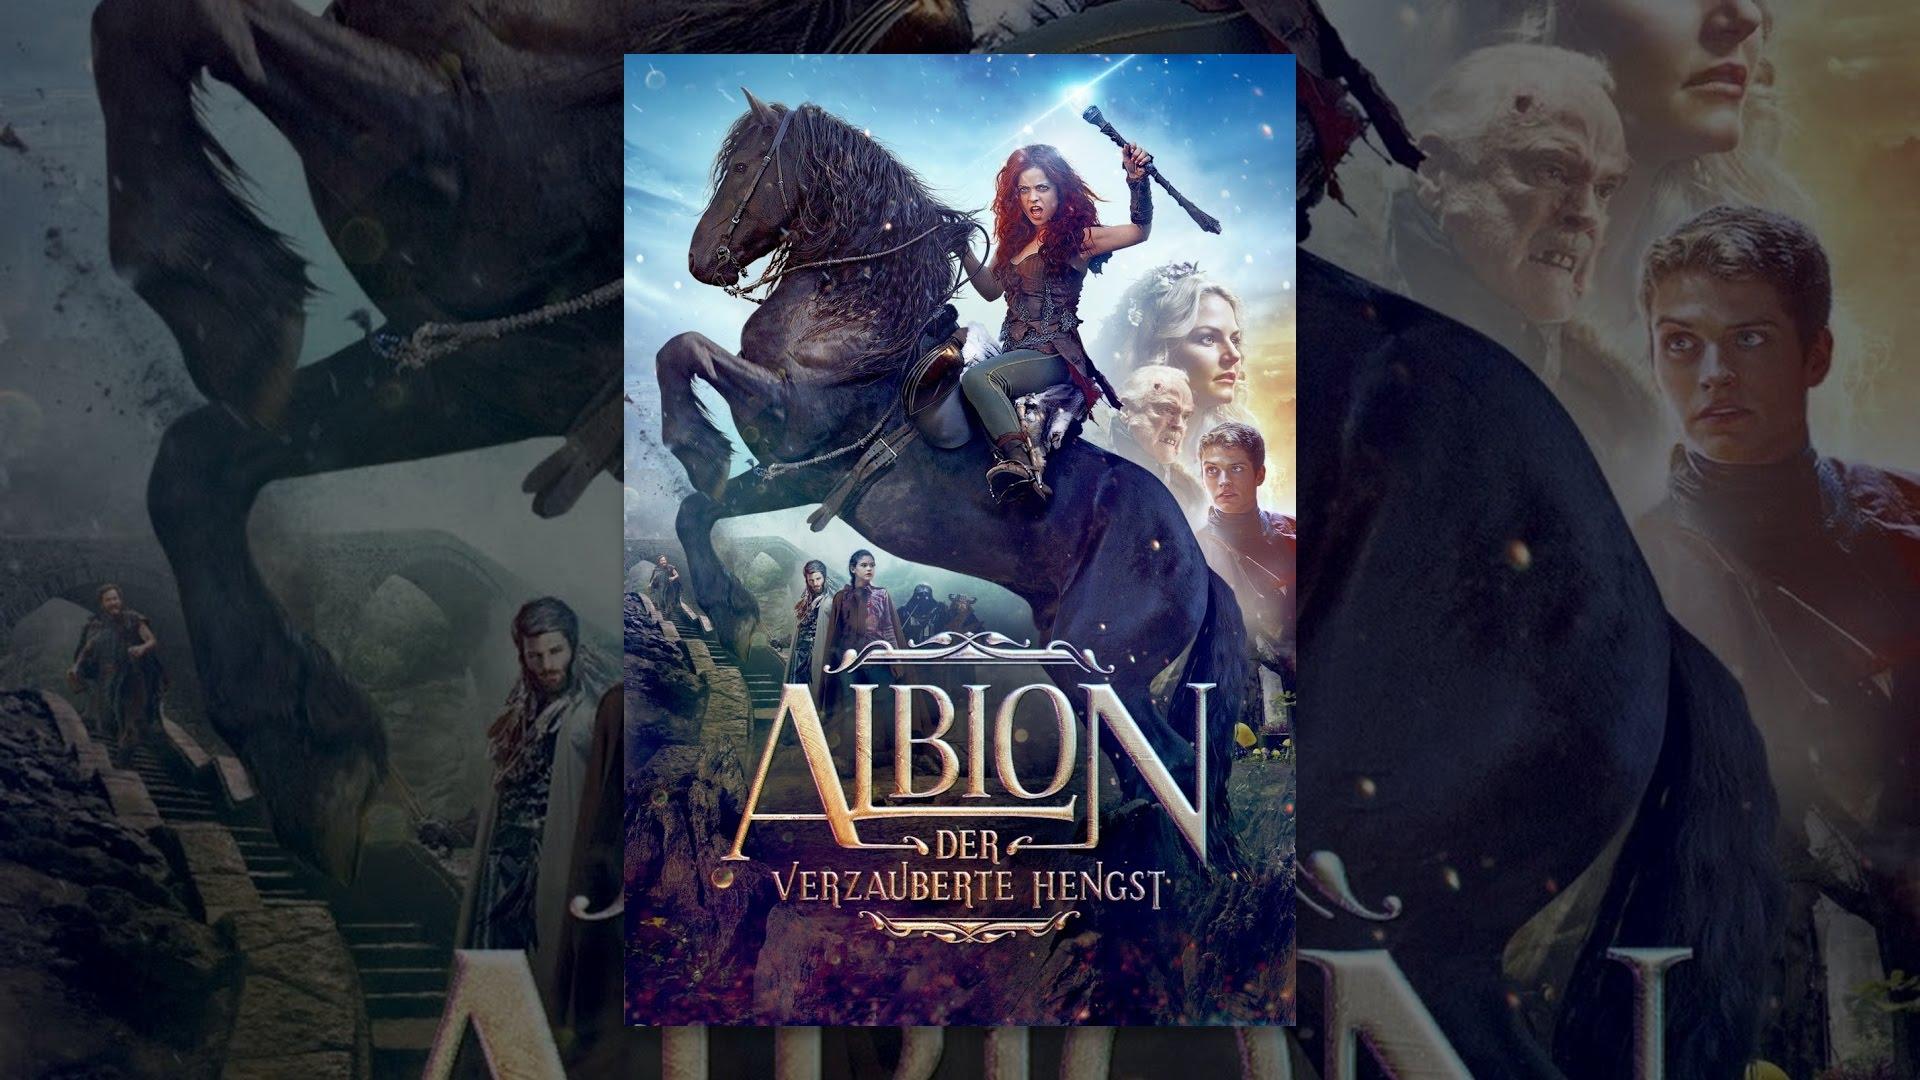 Albion: Der Verzauberte Hengst